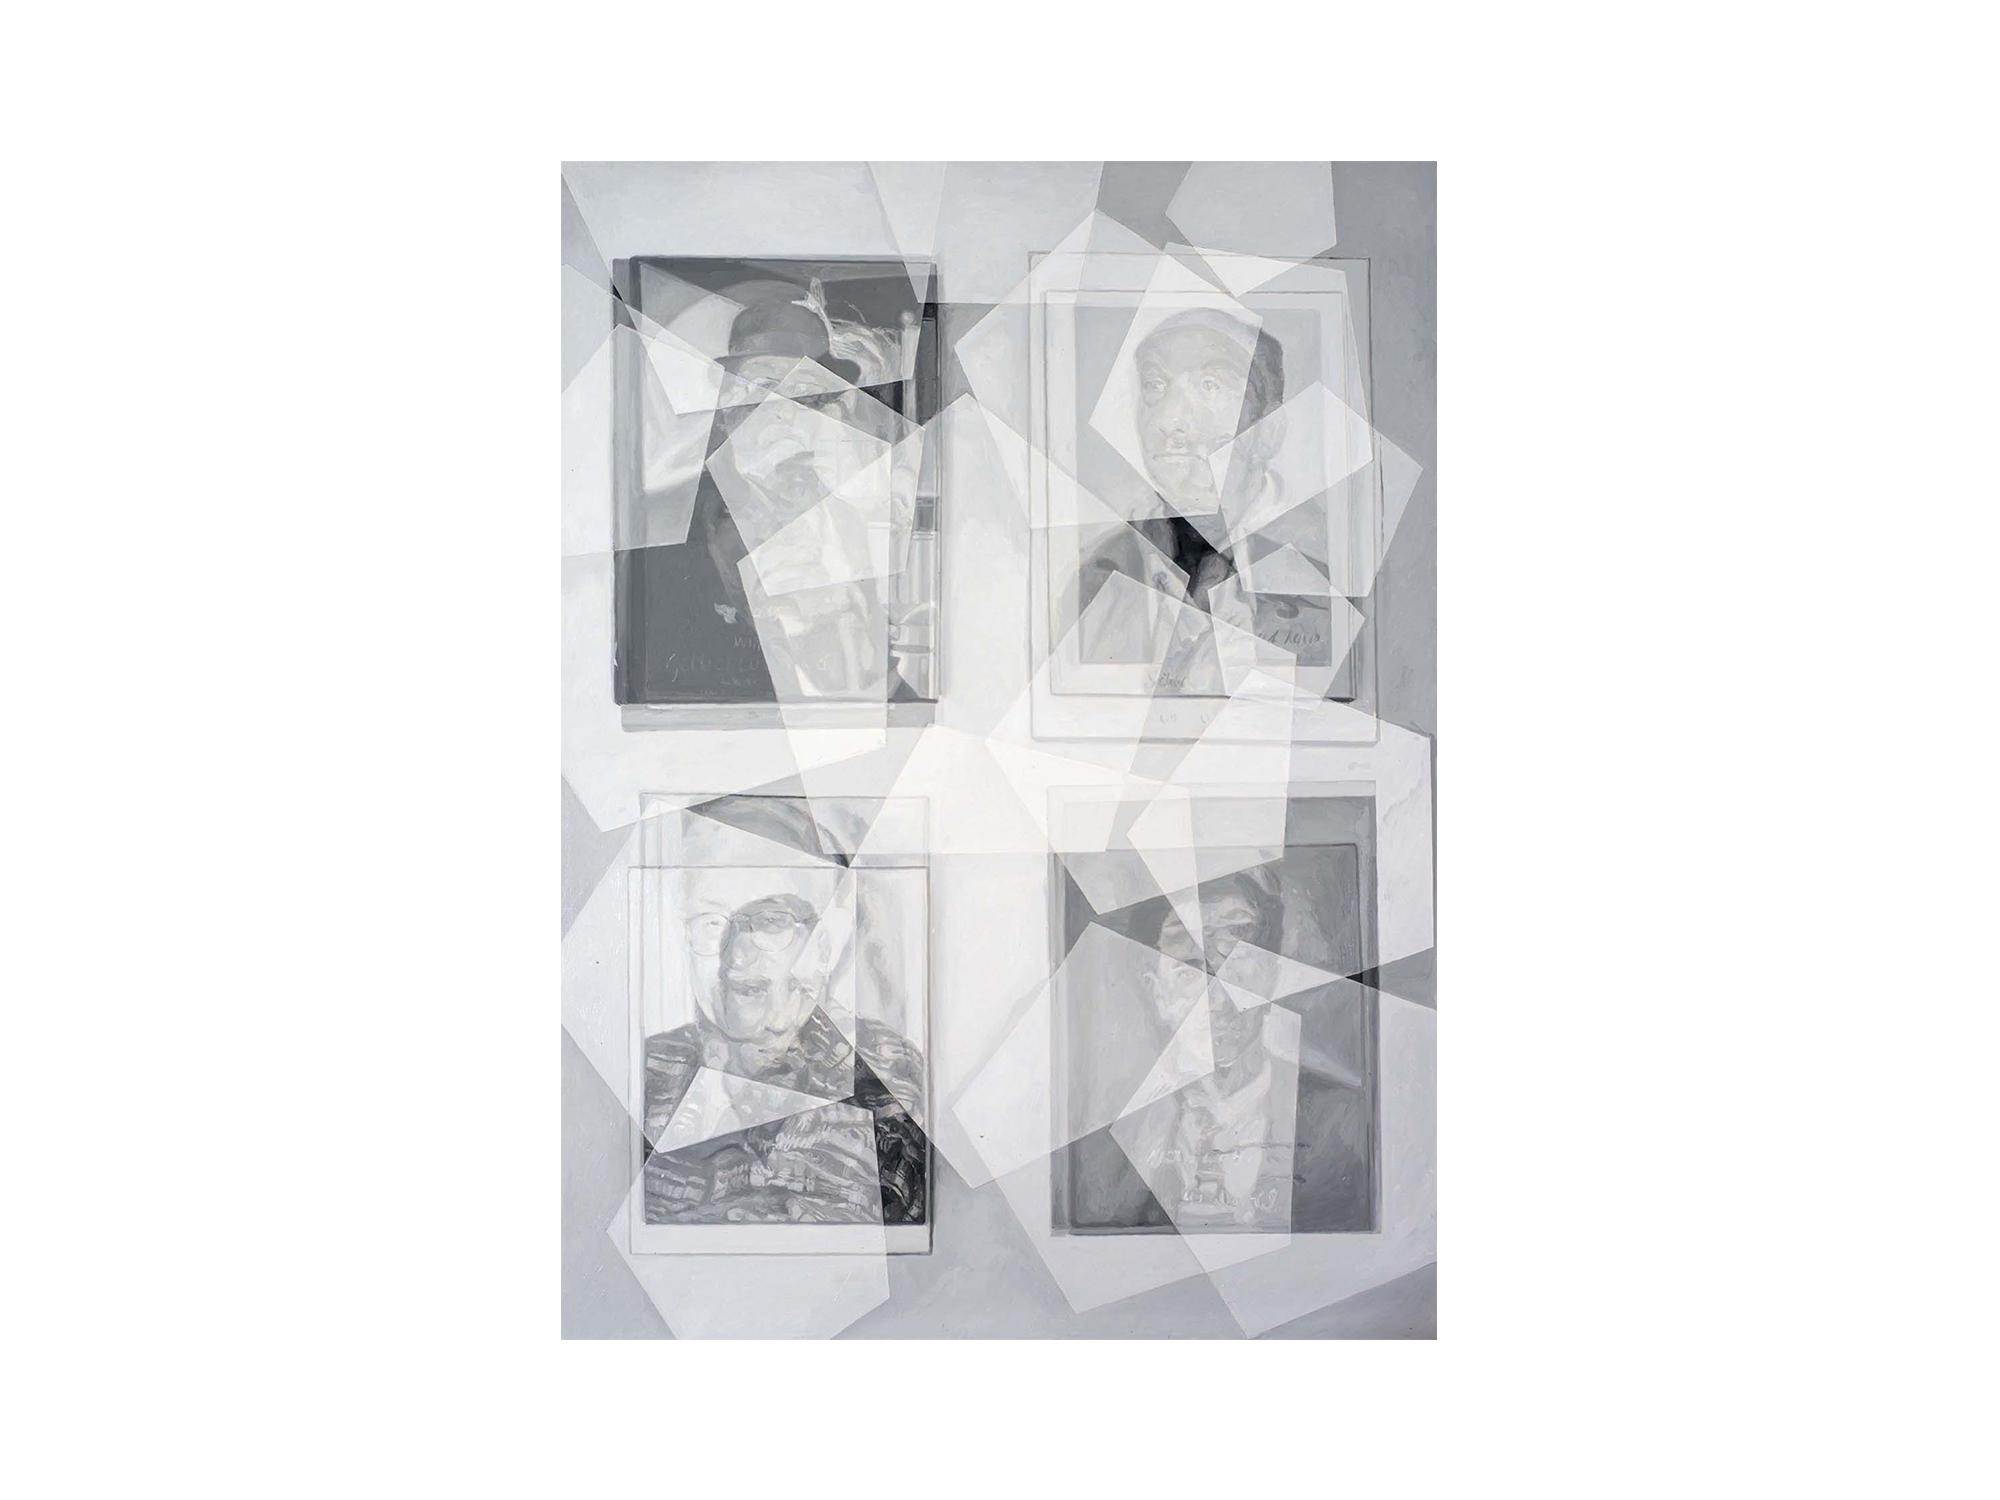 Julie Fragar    Look for All of Us Together , 2016 oil on board 137 x 102cm   ARTIST BIO